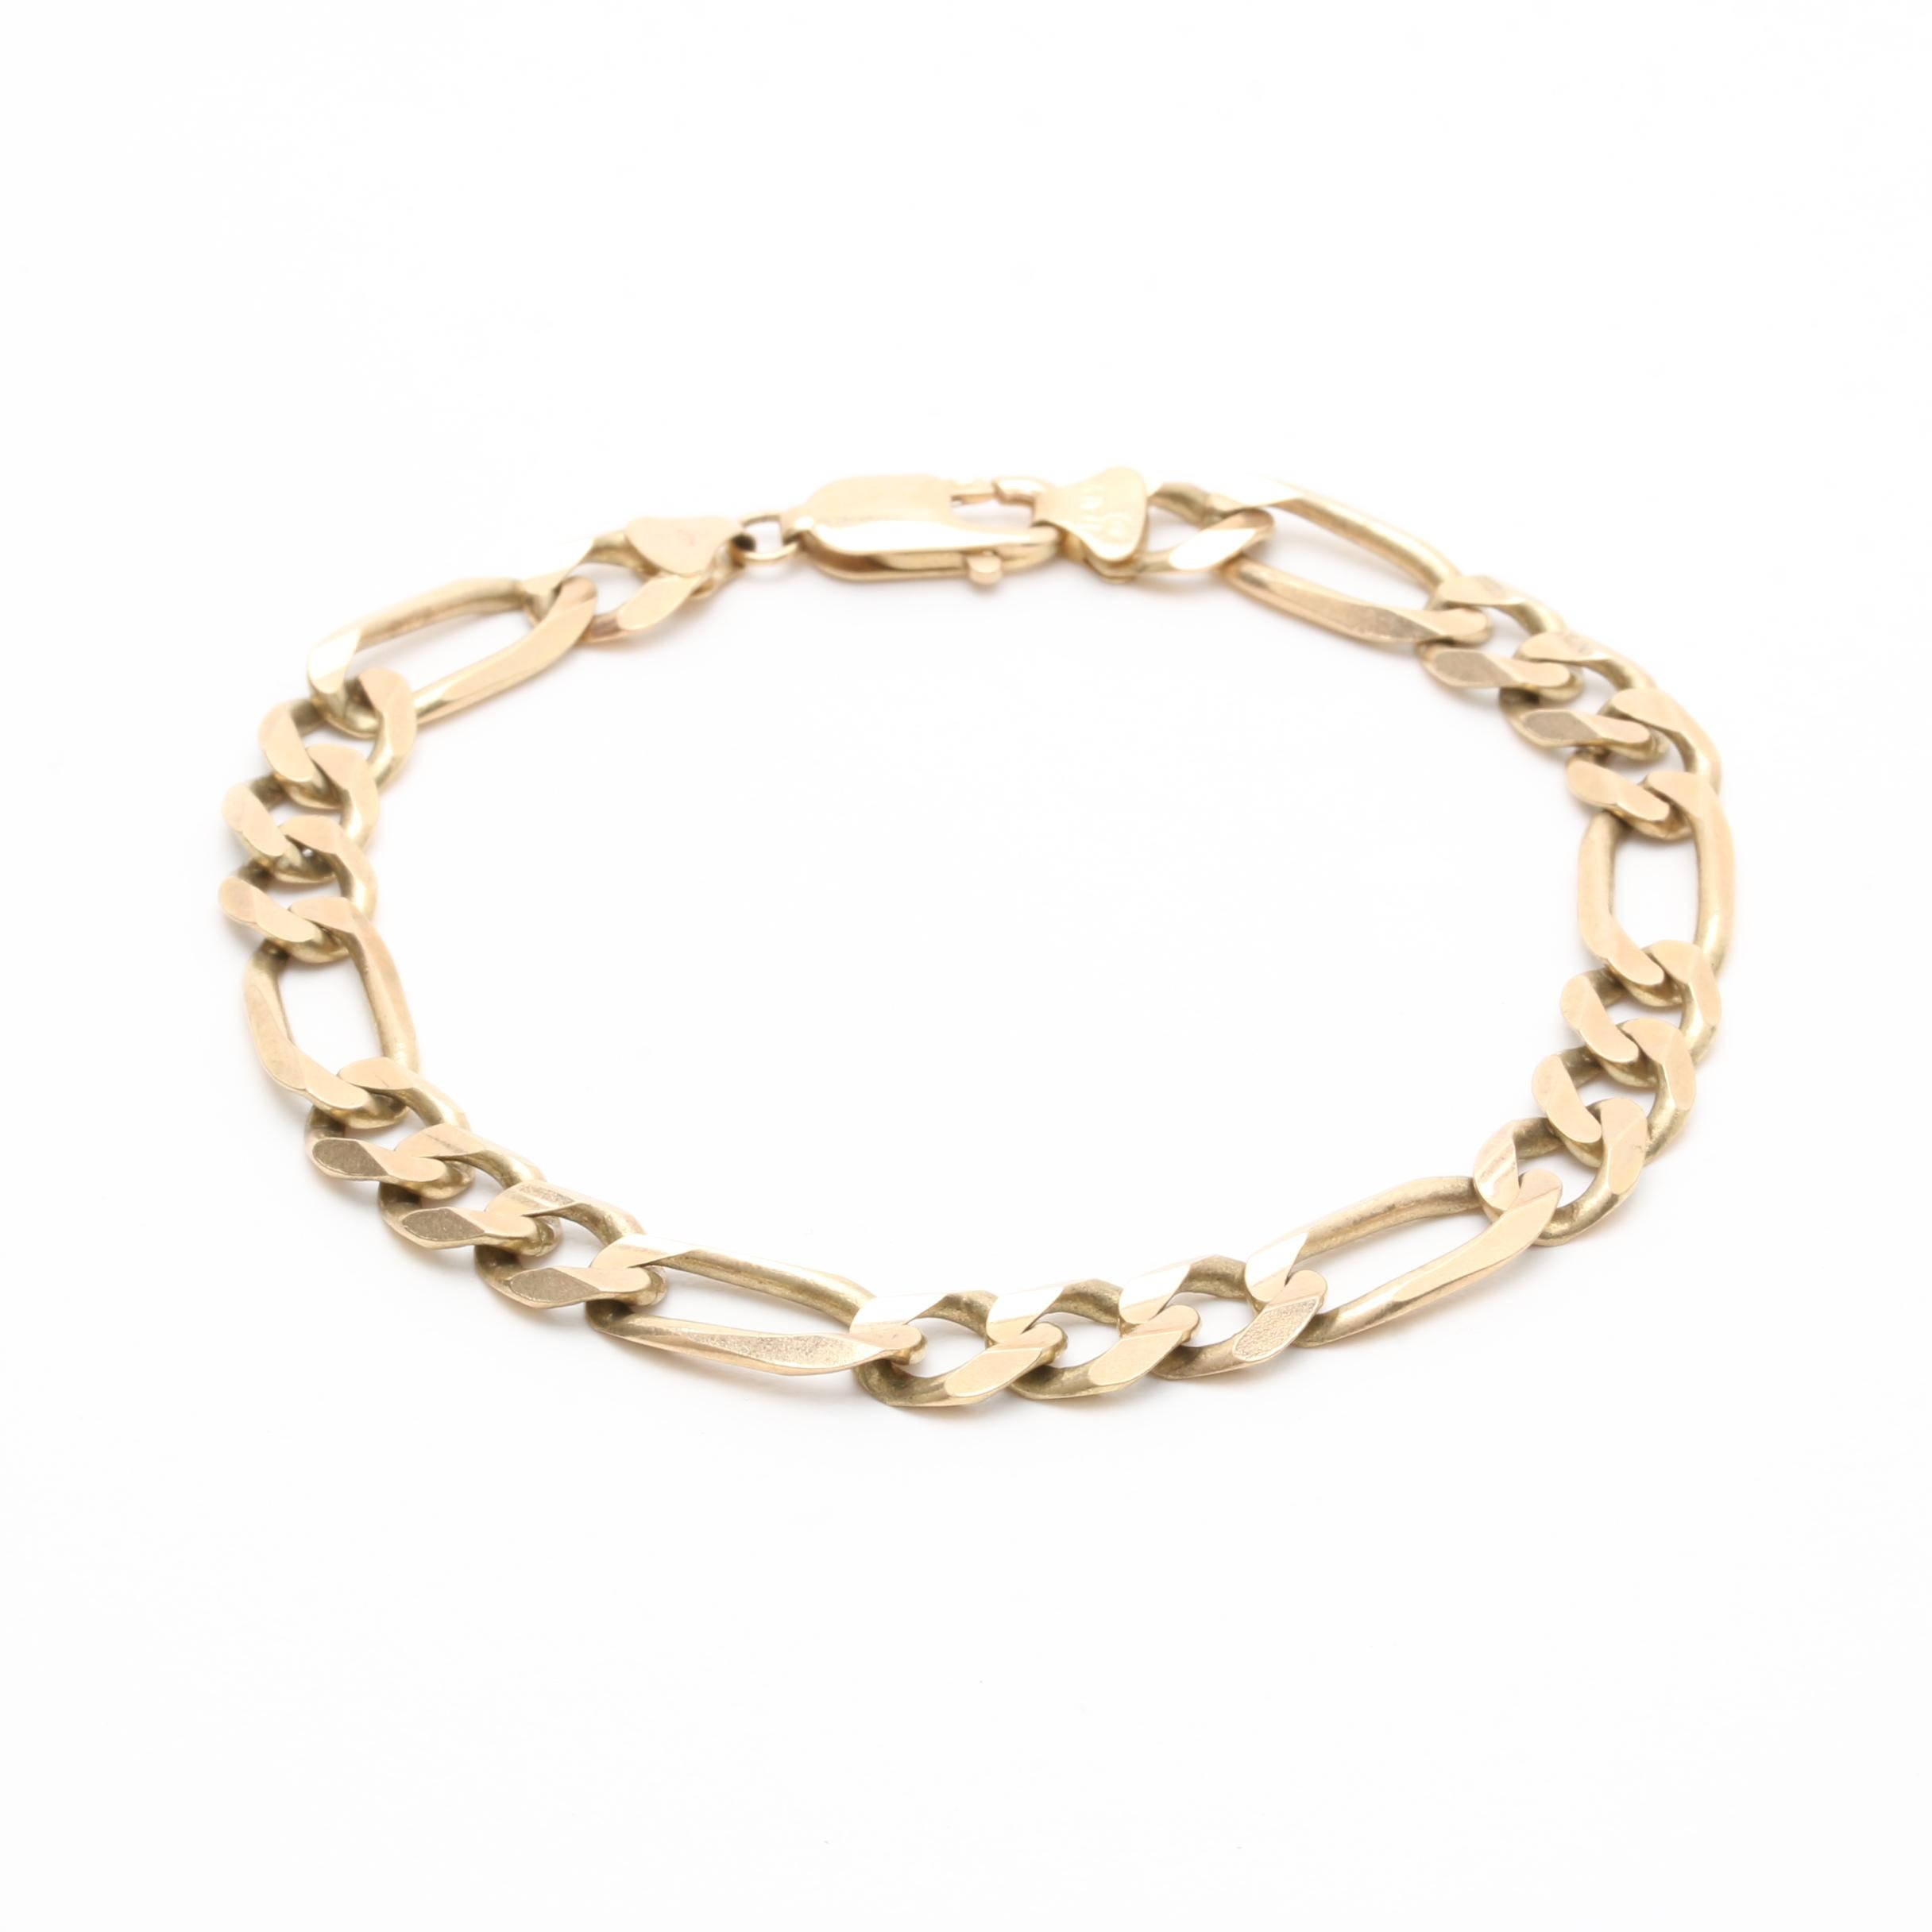 10K Yellow Gold Italian Figaro Link Bracelet